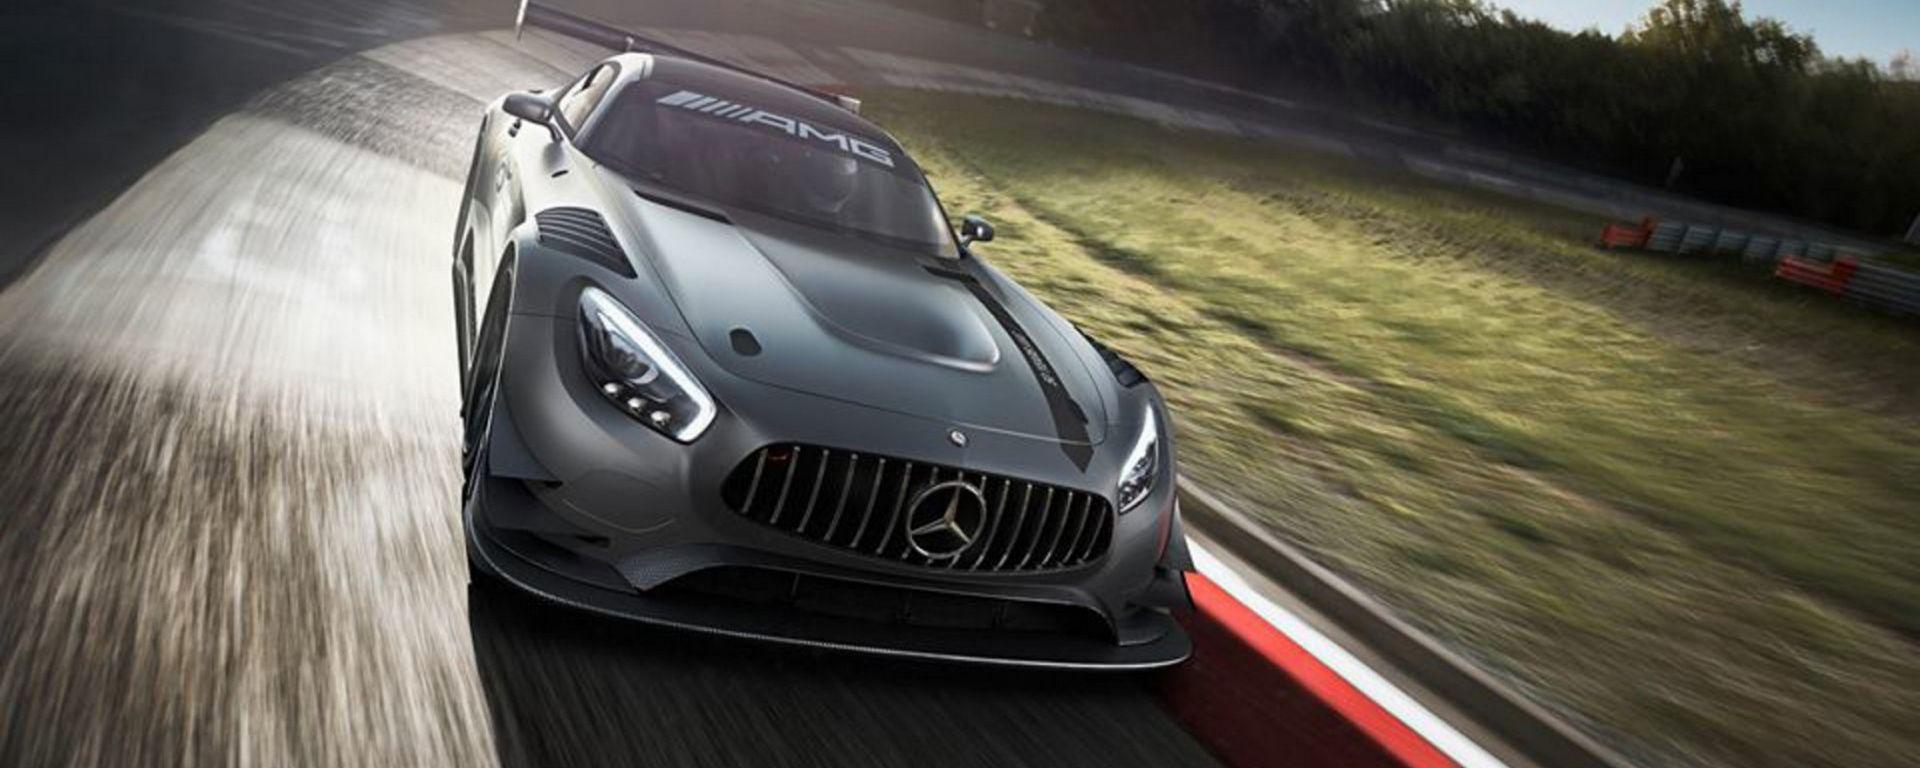 Mercedes-AMG GT3 Edition 50: regalo speciale